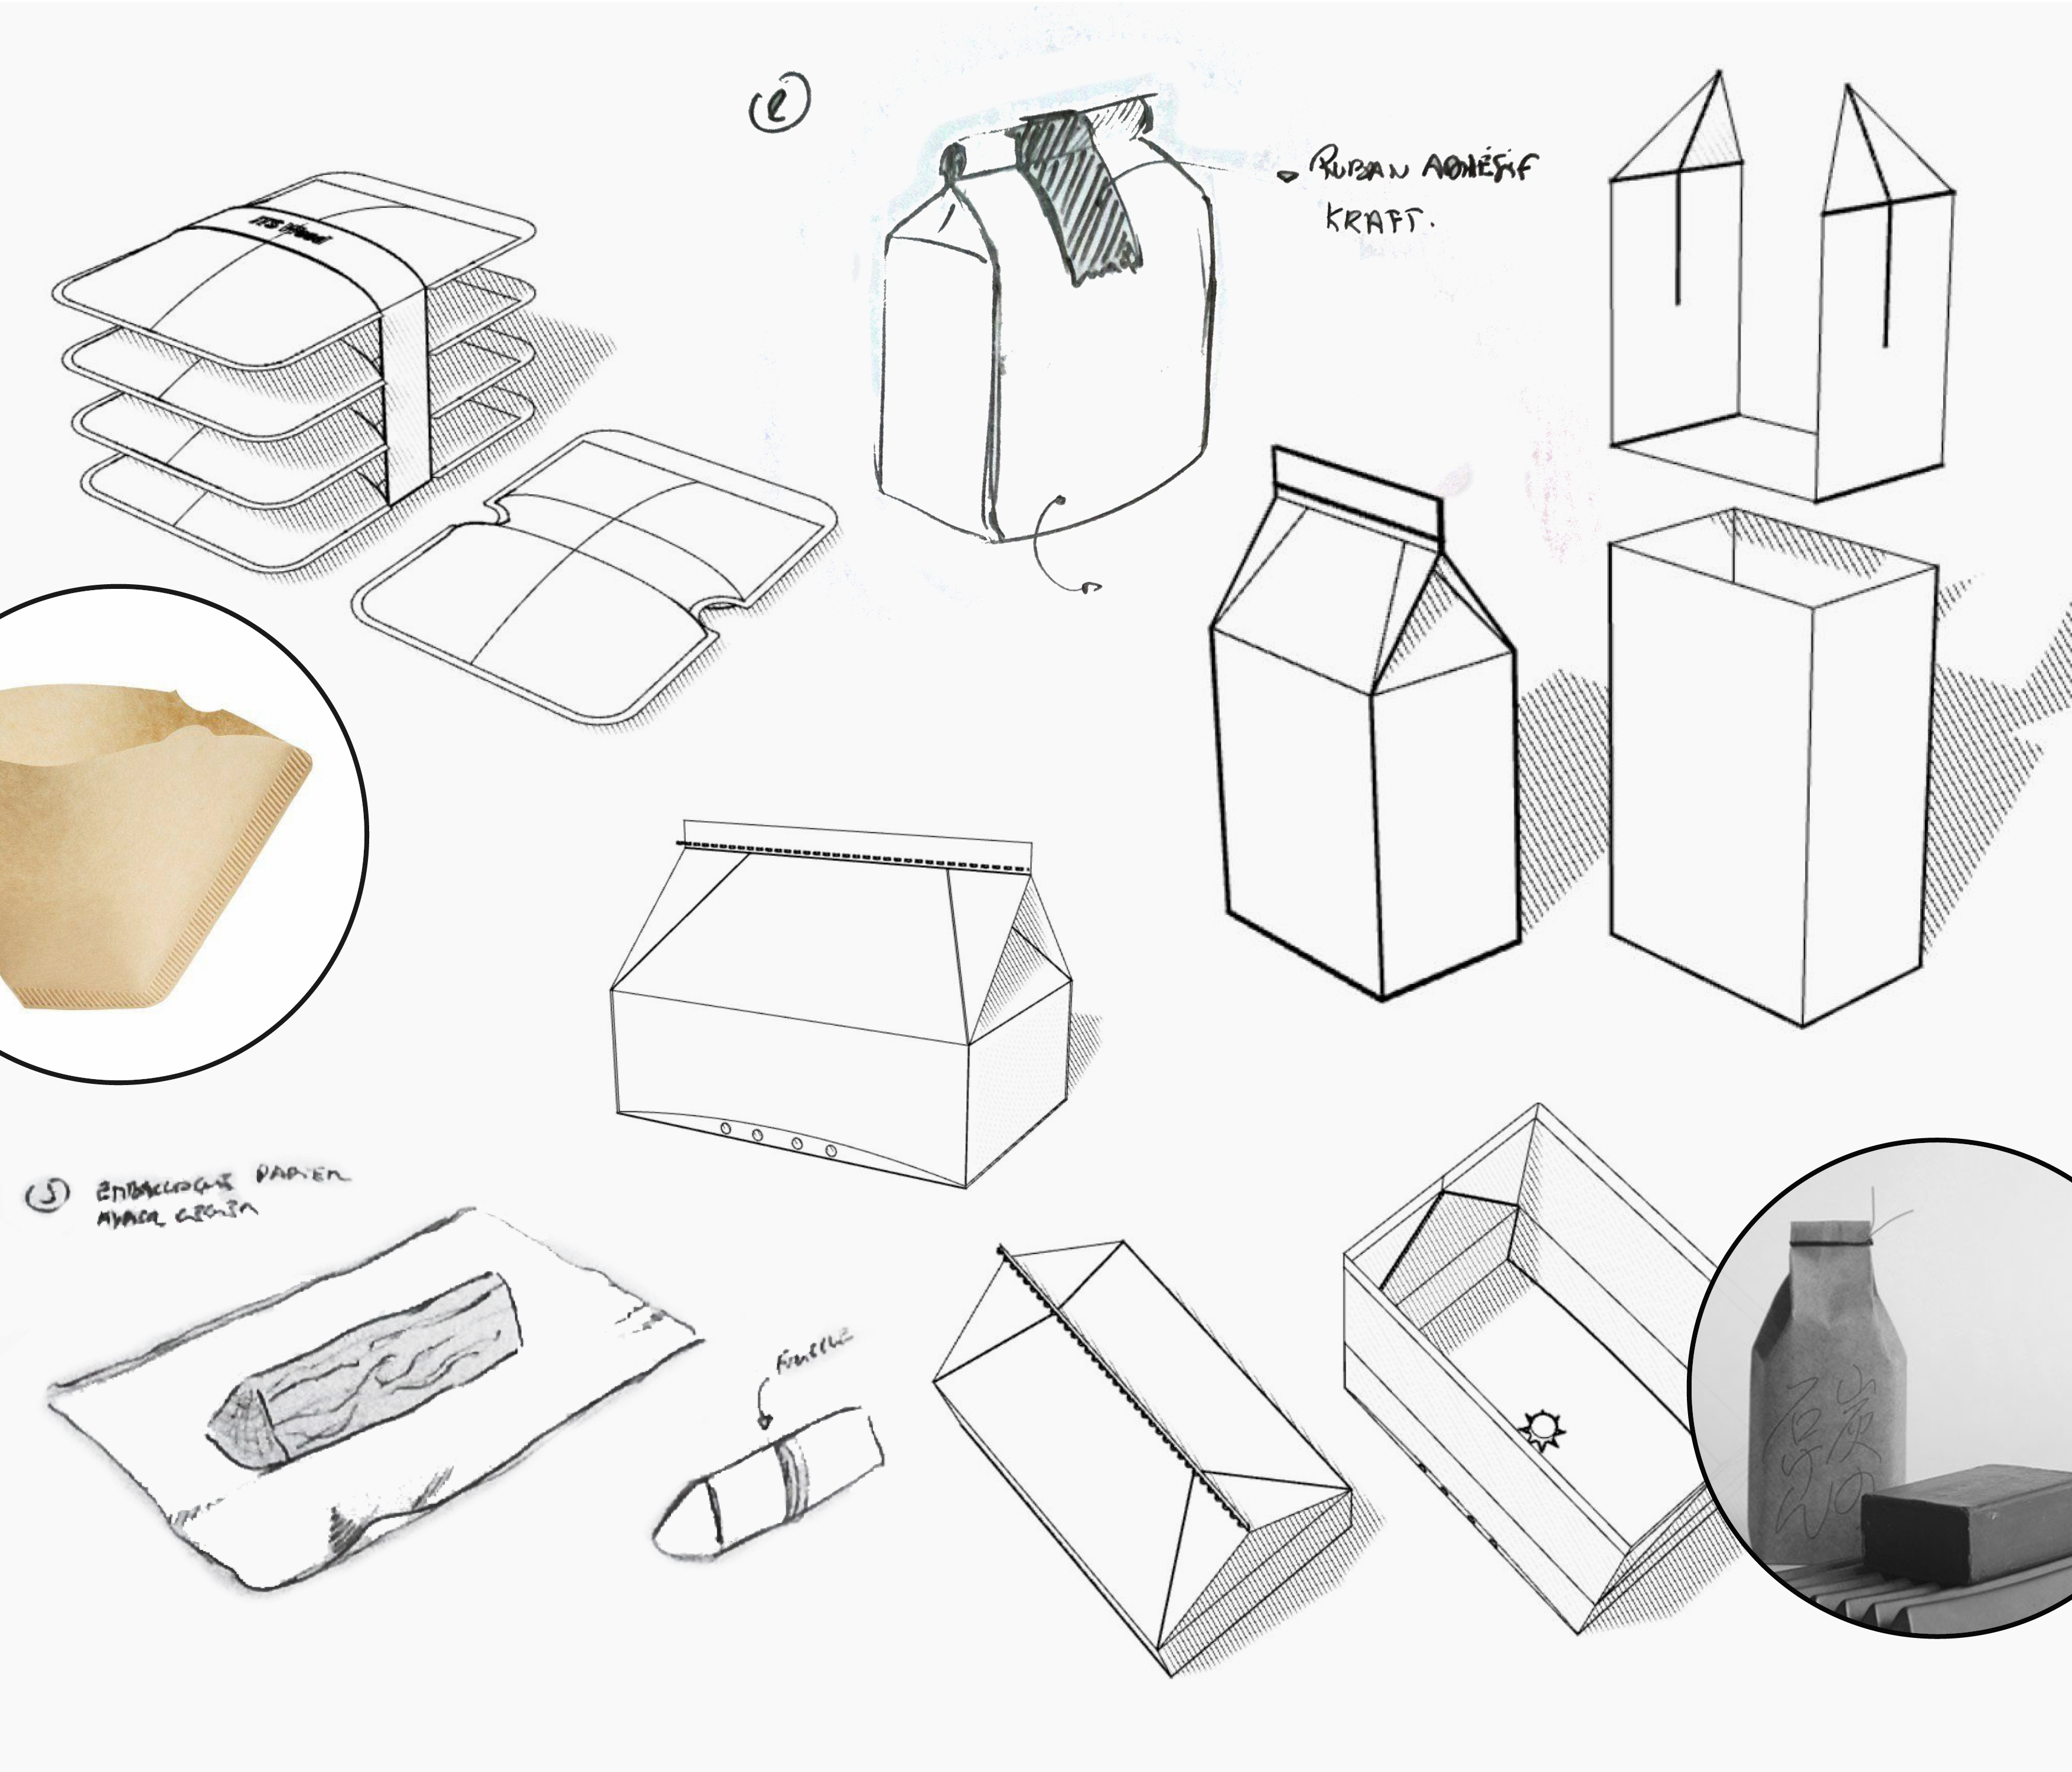 Tcharbon-Sketch-Packaging